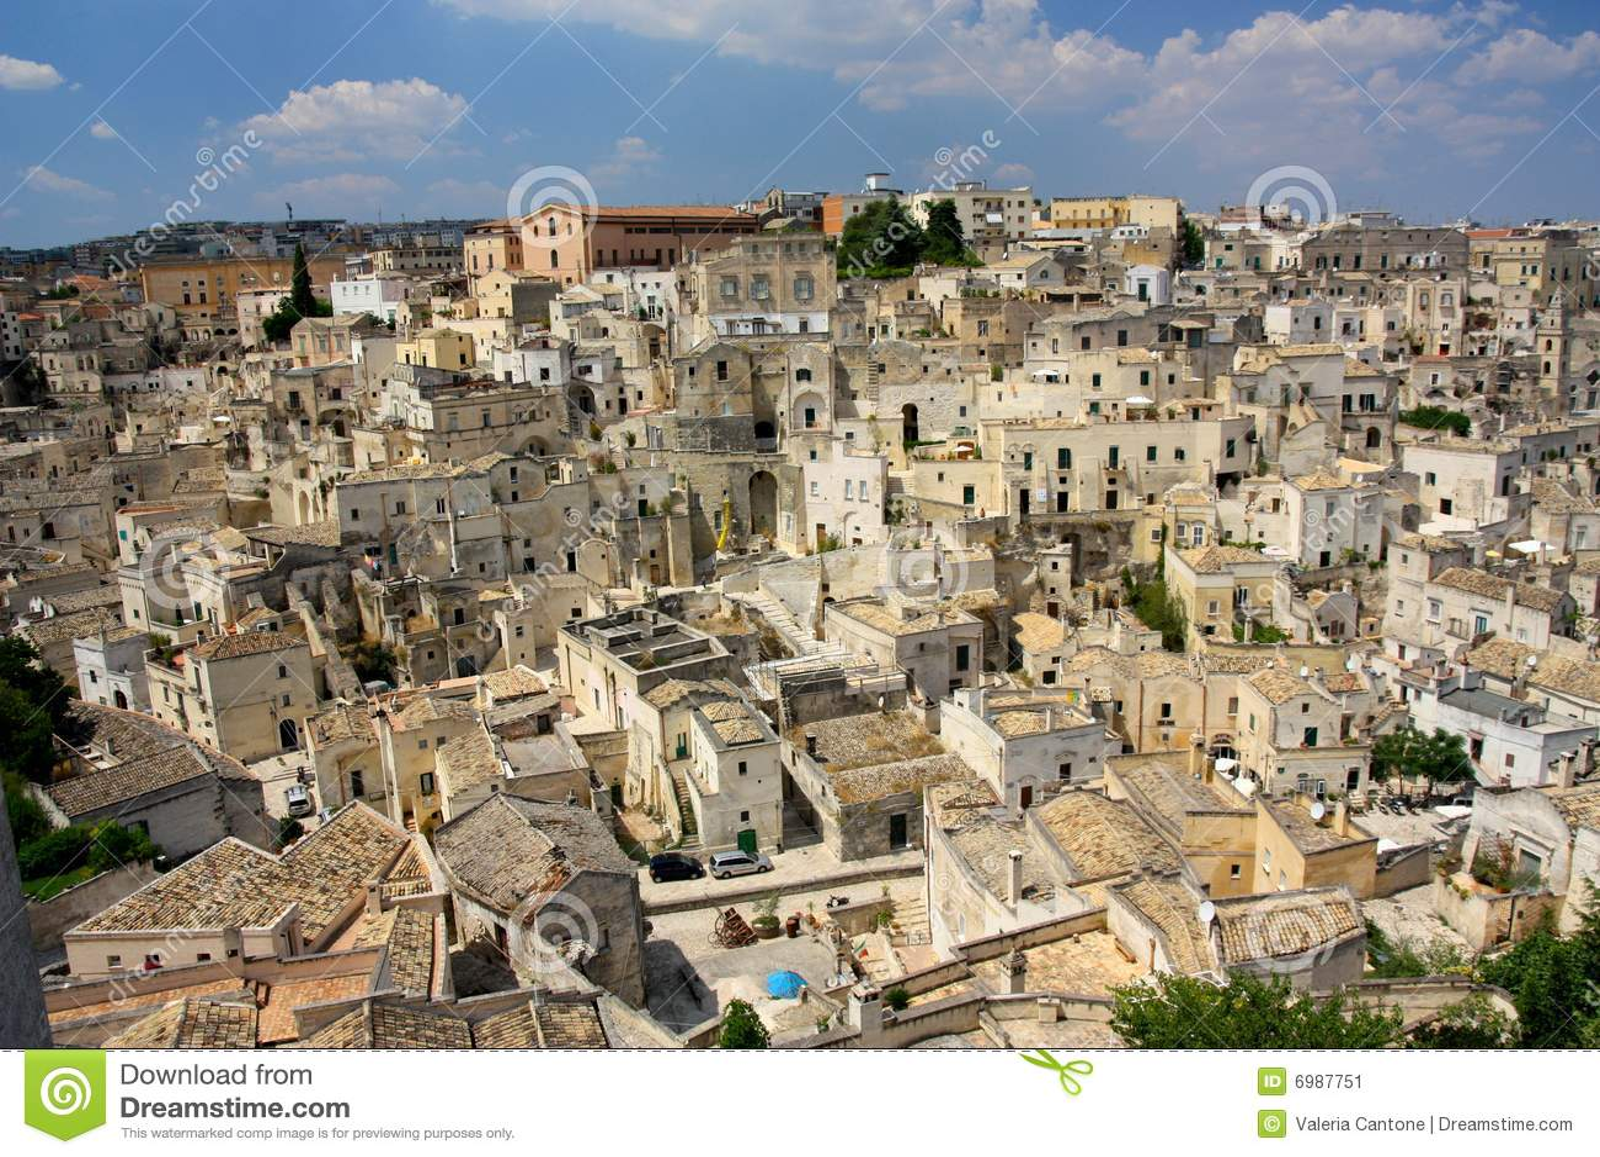 Matera, Basilicata, Italy Stock Image - Image: 6987751